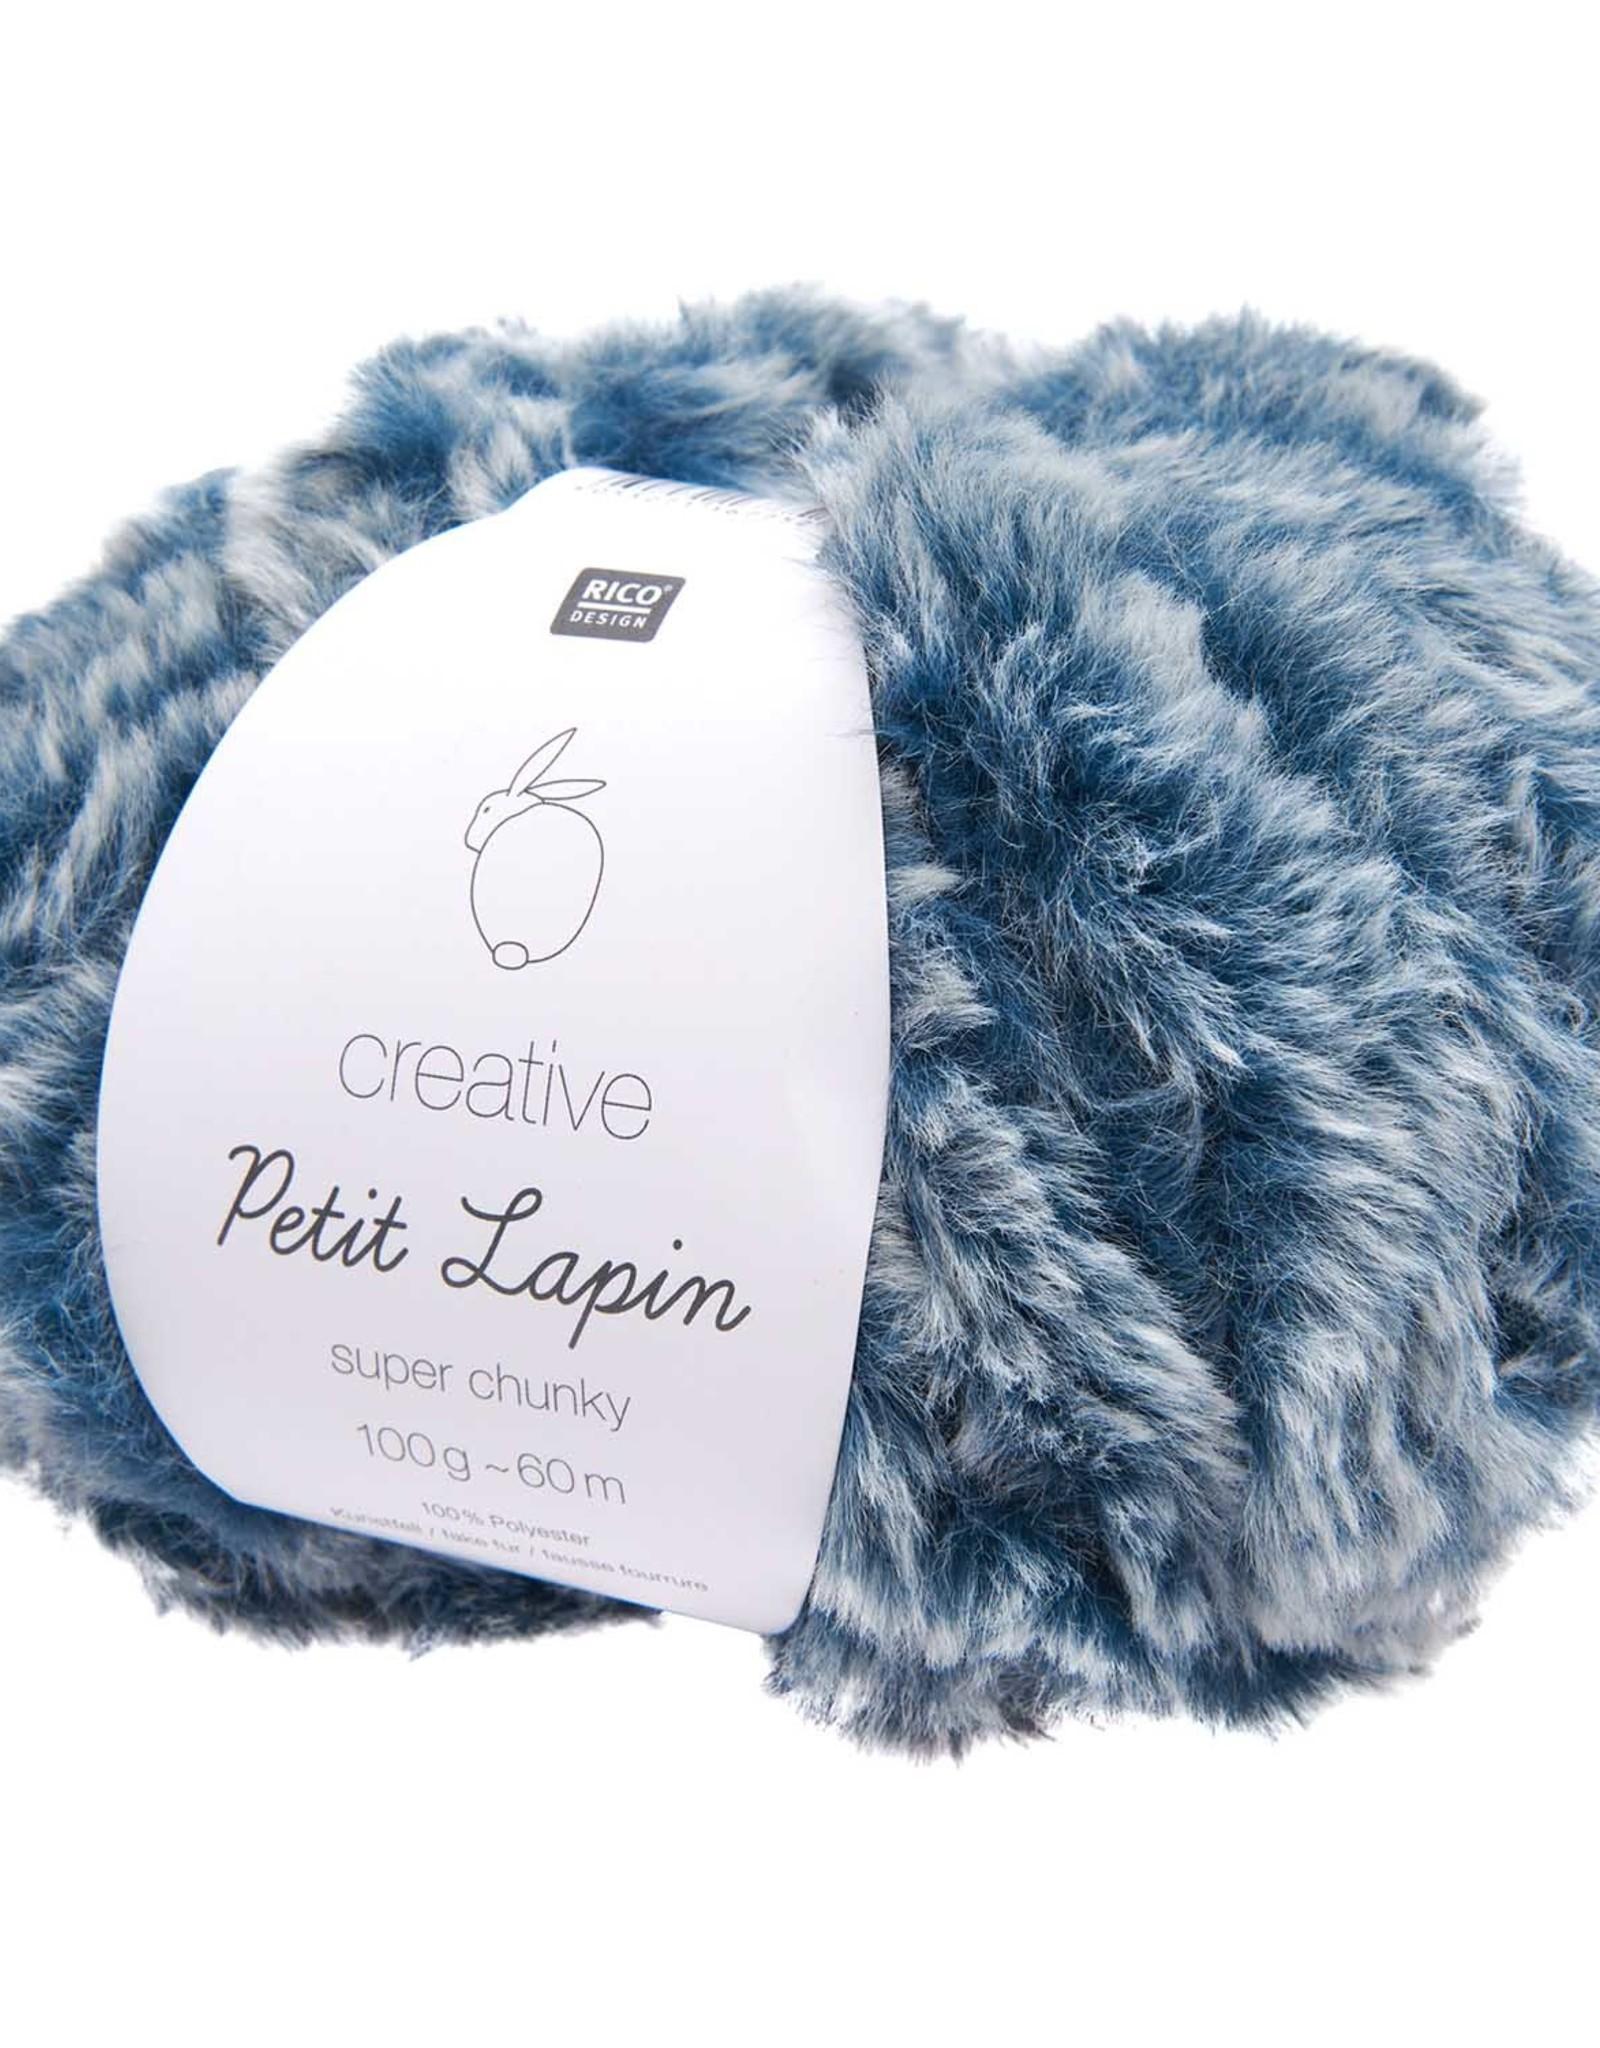 Rico Design Creative Petit Lapin Super chunky